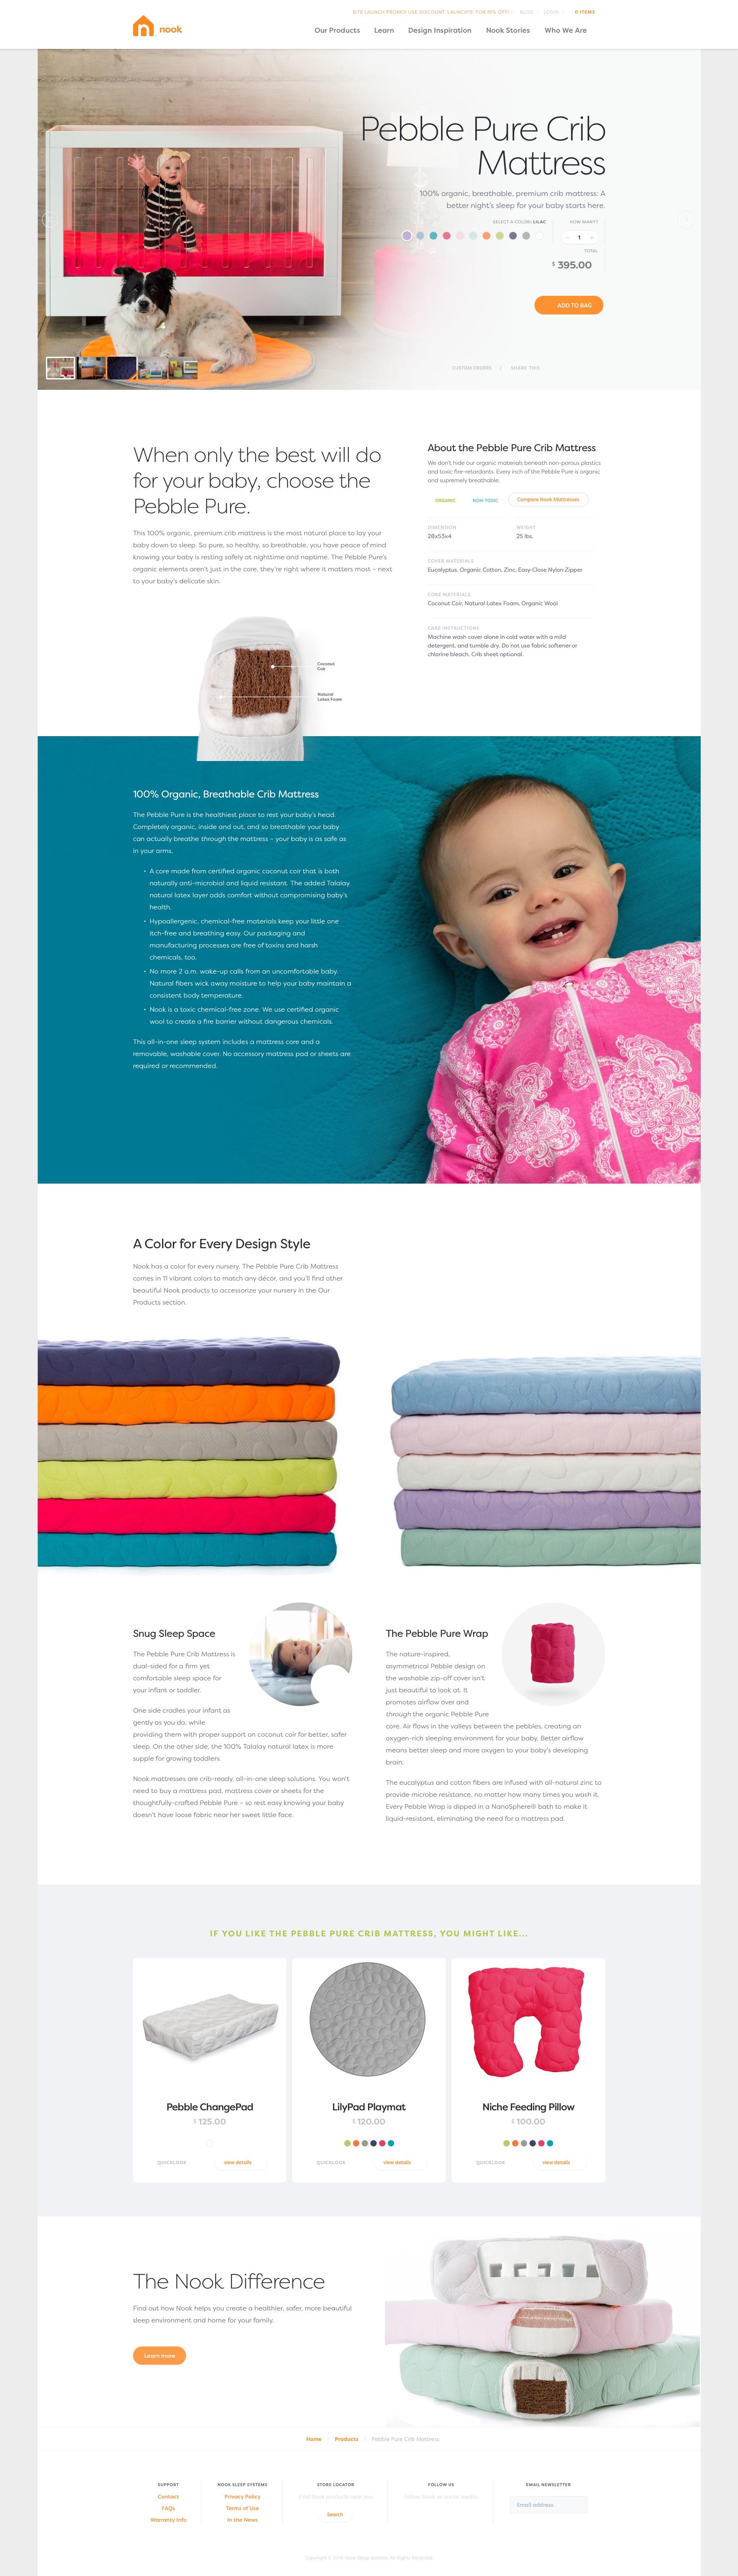 Pebble Pure Crib Mattress | Nook Sleep Systems.jpg